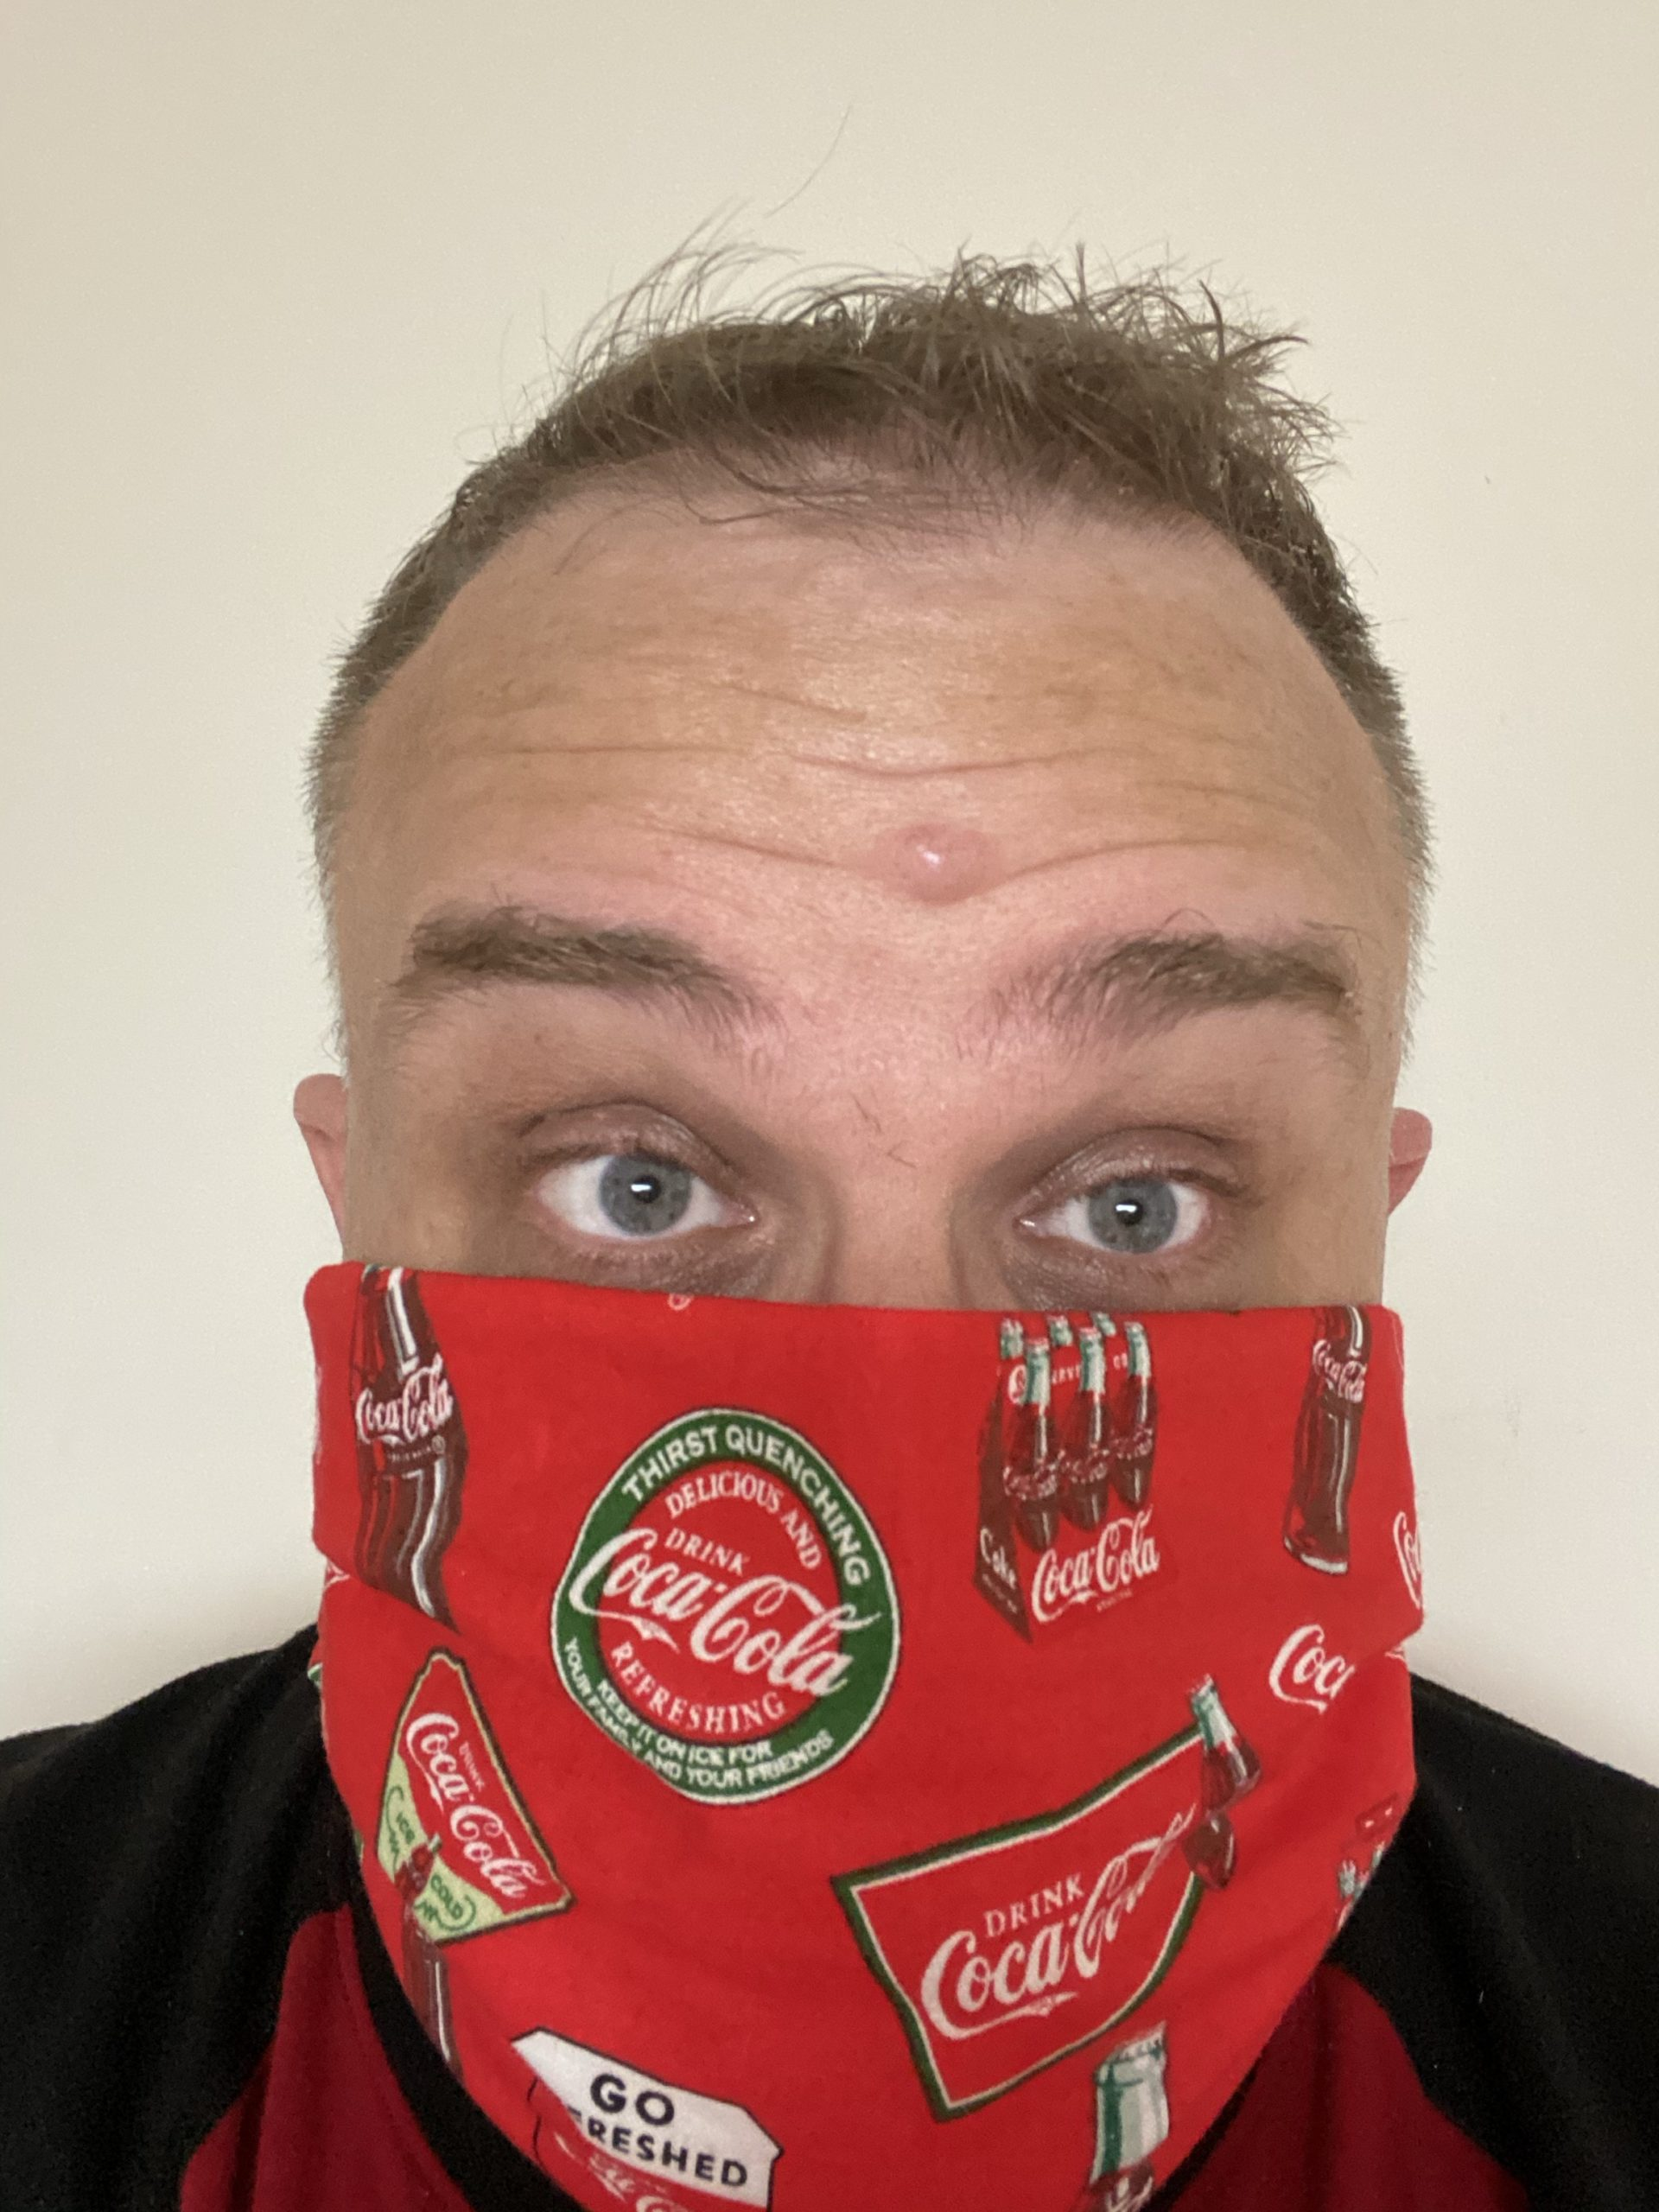 Coca-Cola Face Mask (Coke Face Mask) #CocaCola #Coke #FaceMask